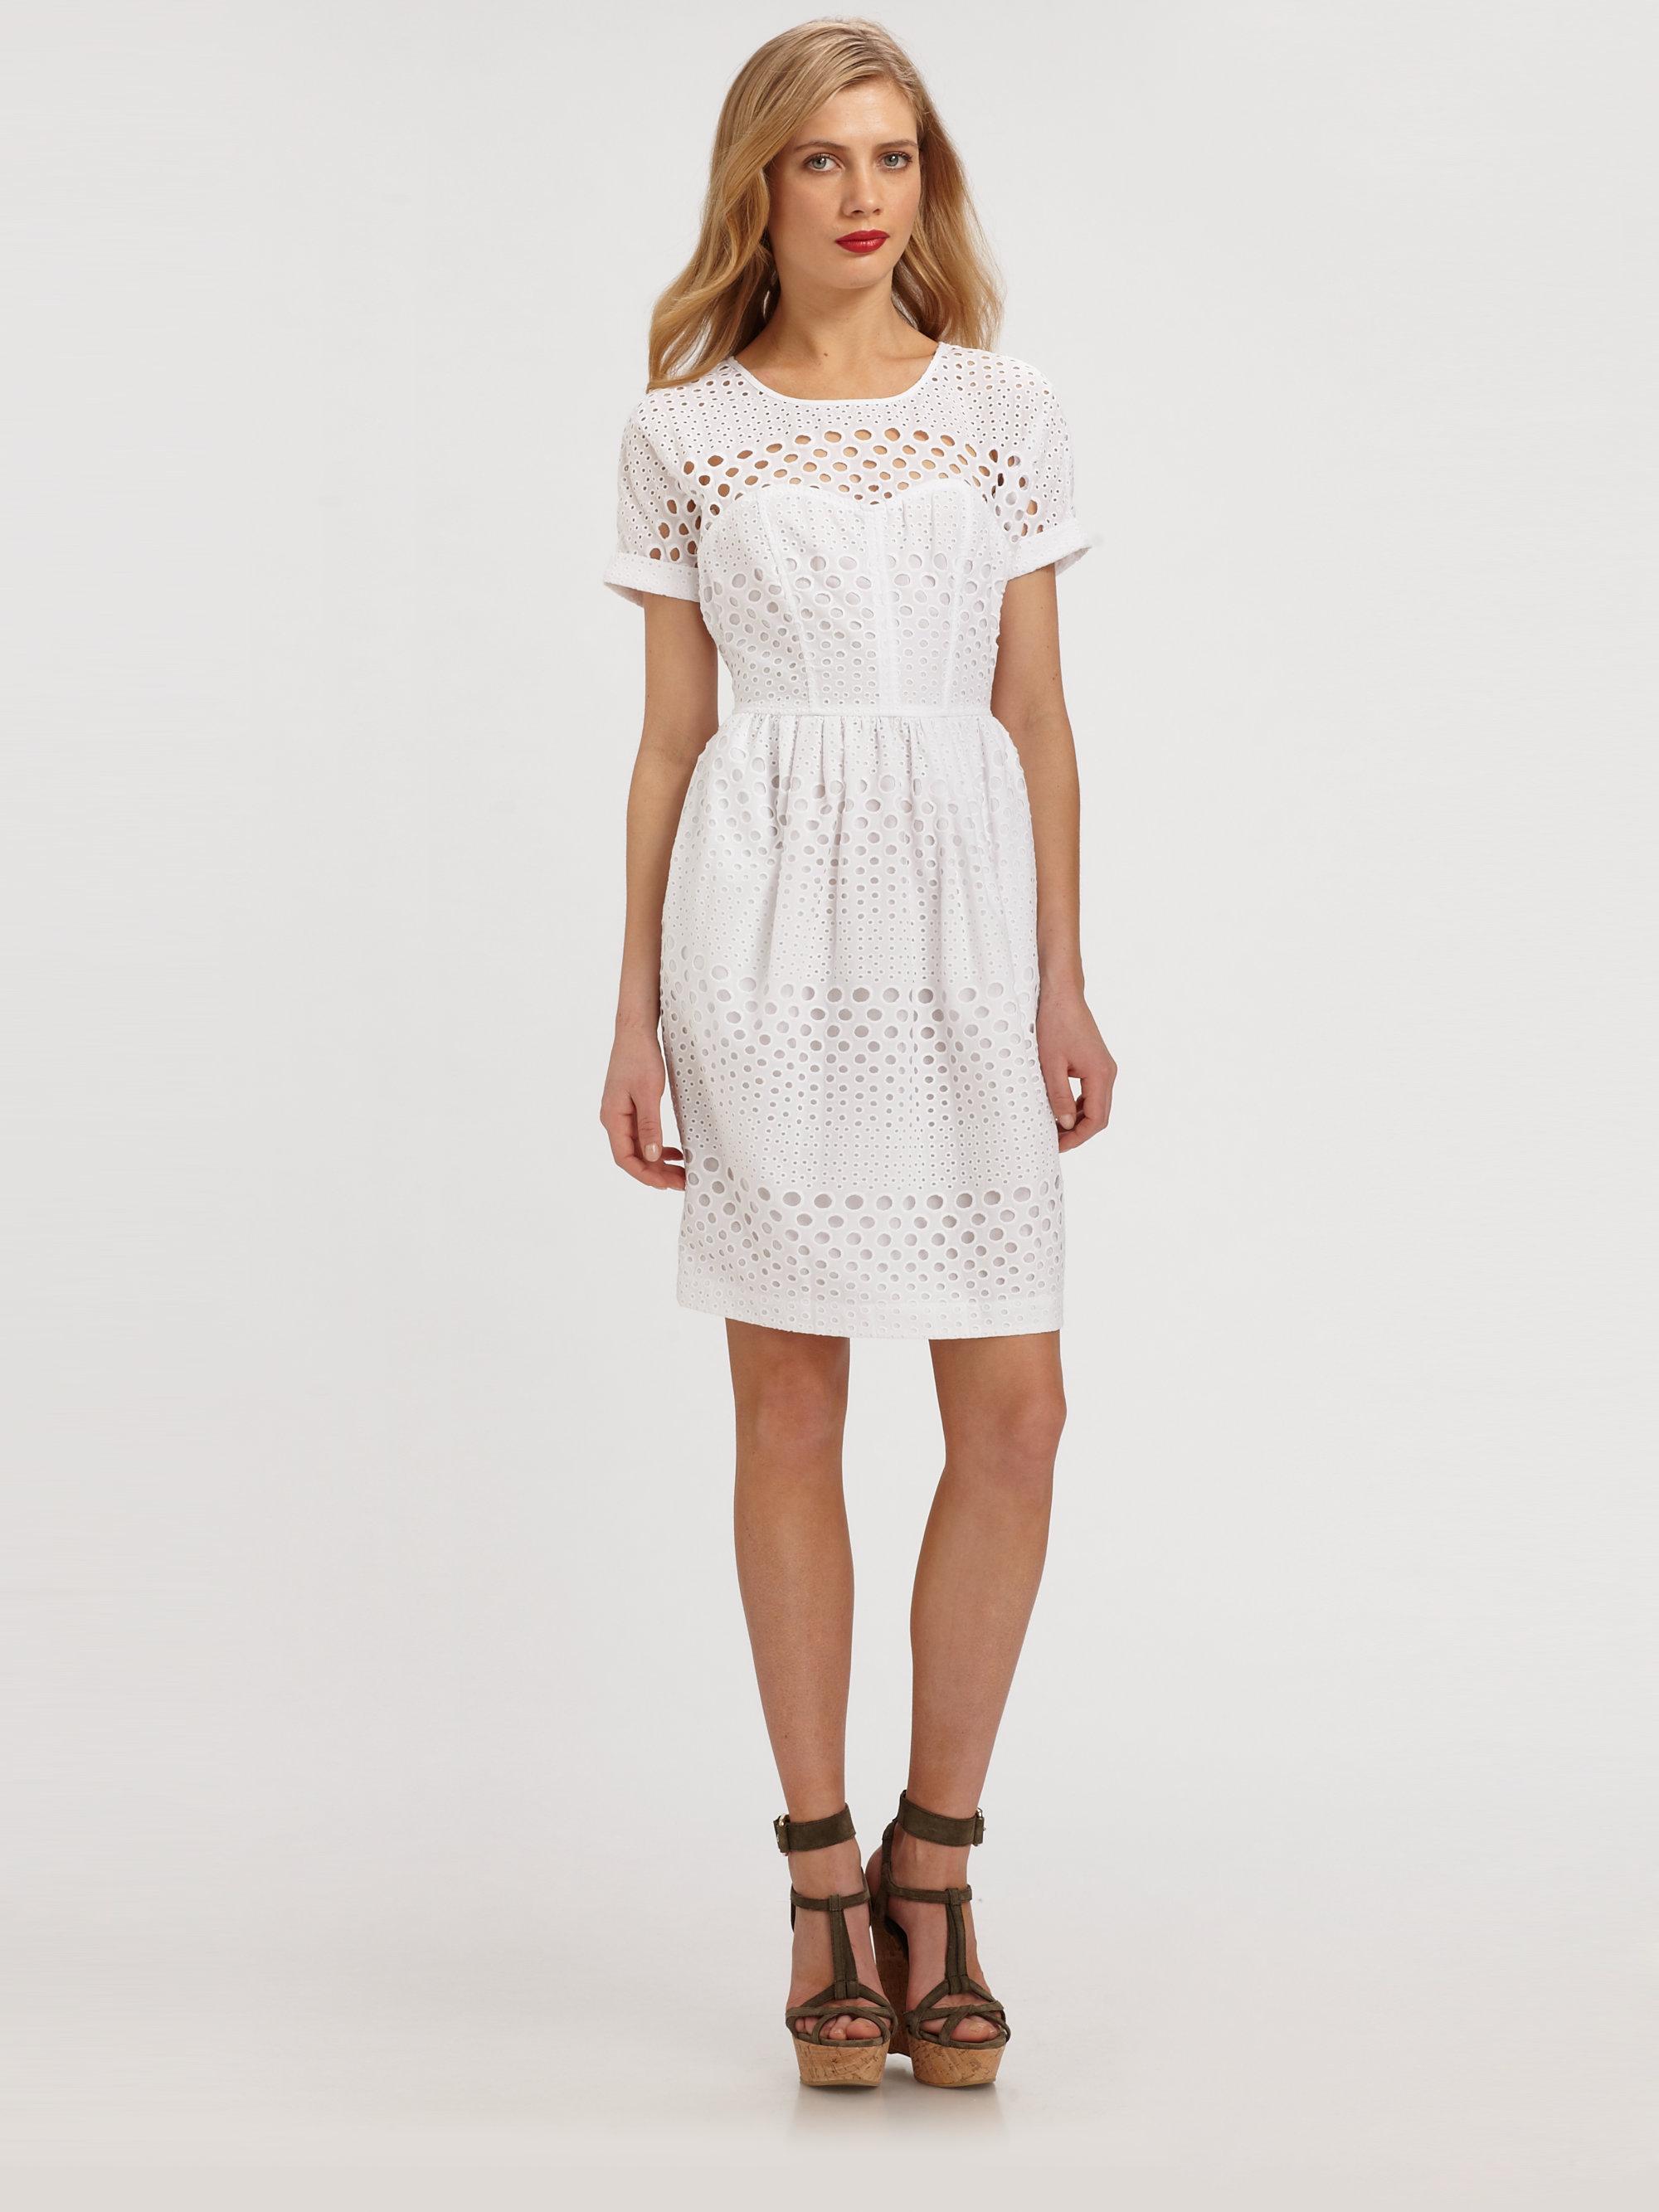 Burberry brit Cotton Eyelet Dress in White  Lyst